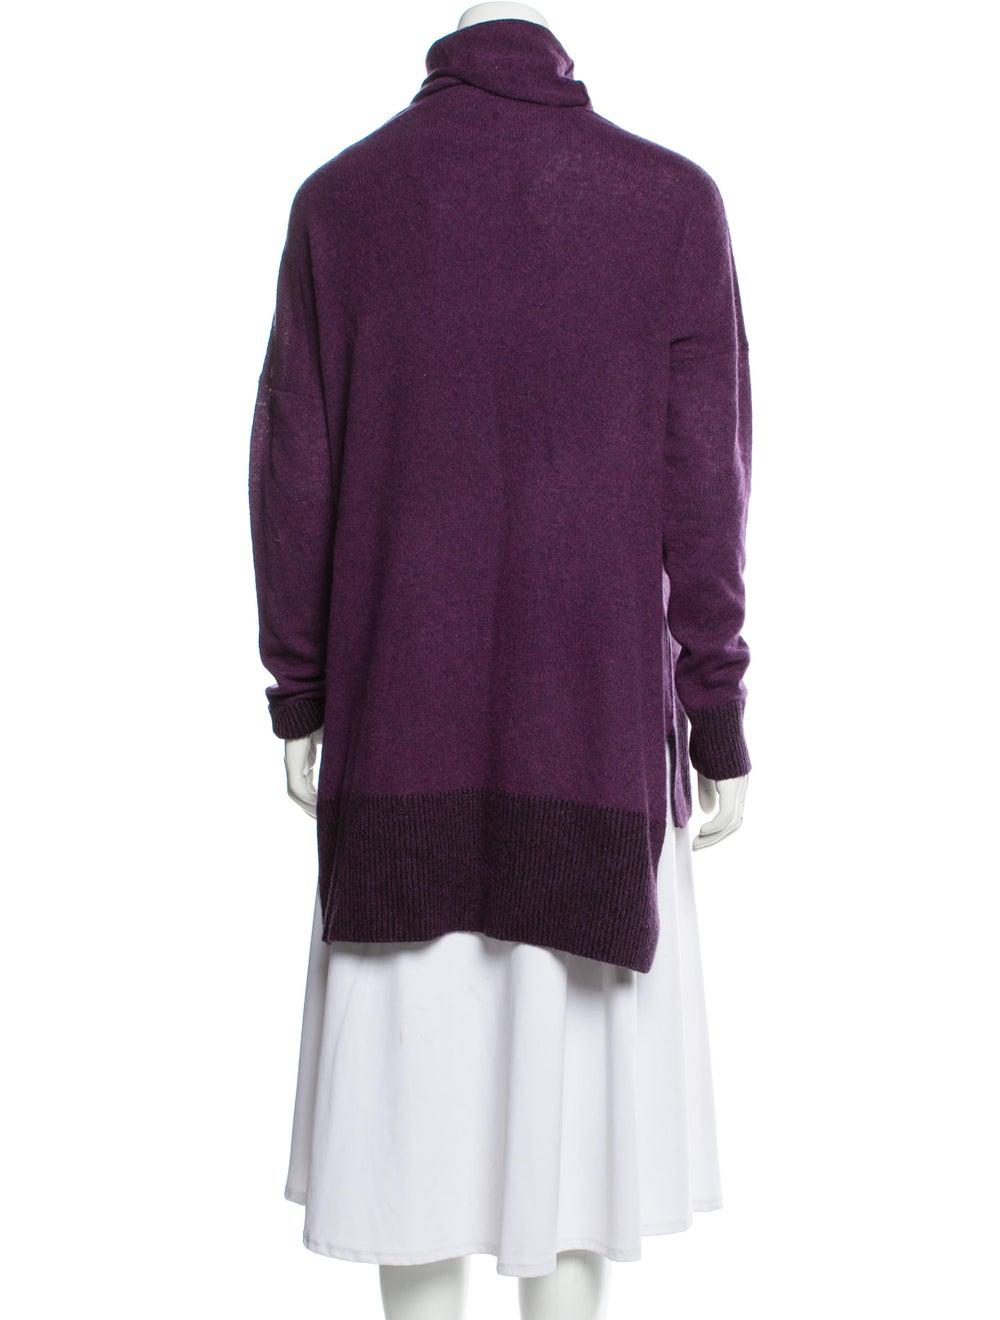 White + Warren Cashmere Turtleneck Sweater White - image 3